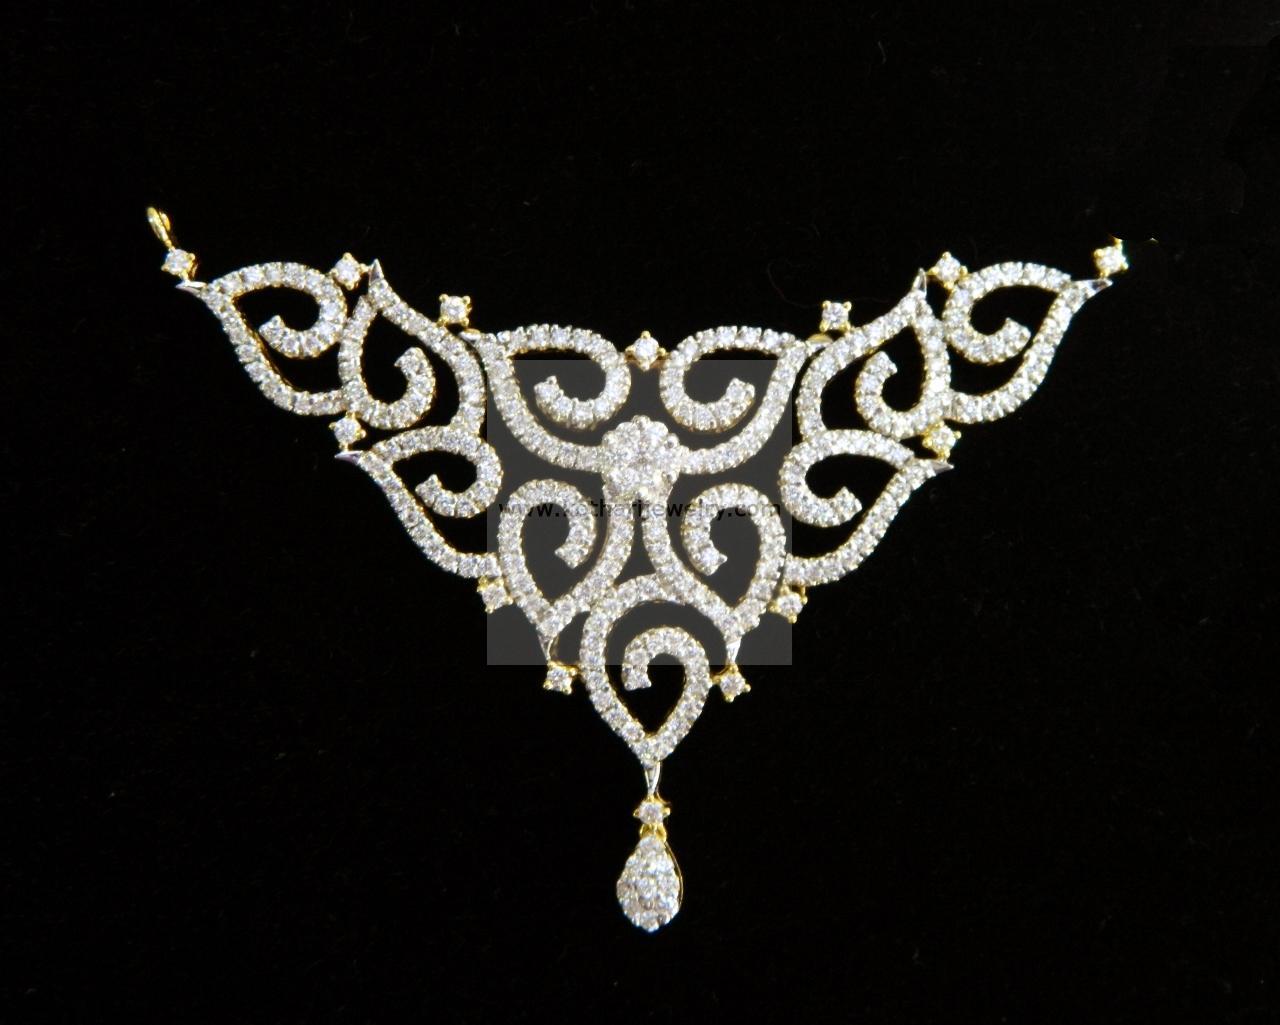 Diamond mangalsutra diamond jewelry diamond mangalsutra diamond mangalsutra diamond jewelry diamond mangalsutra usd 242984 aloadofball Images